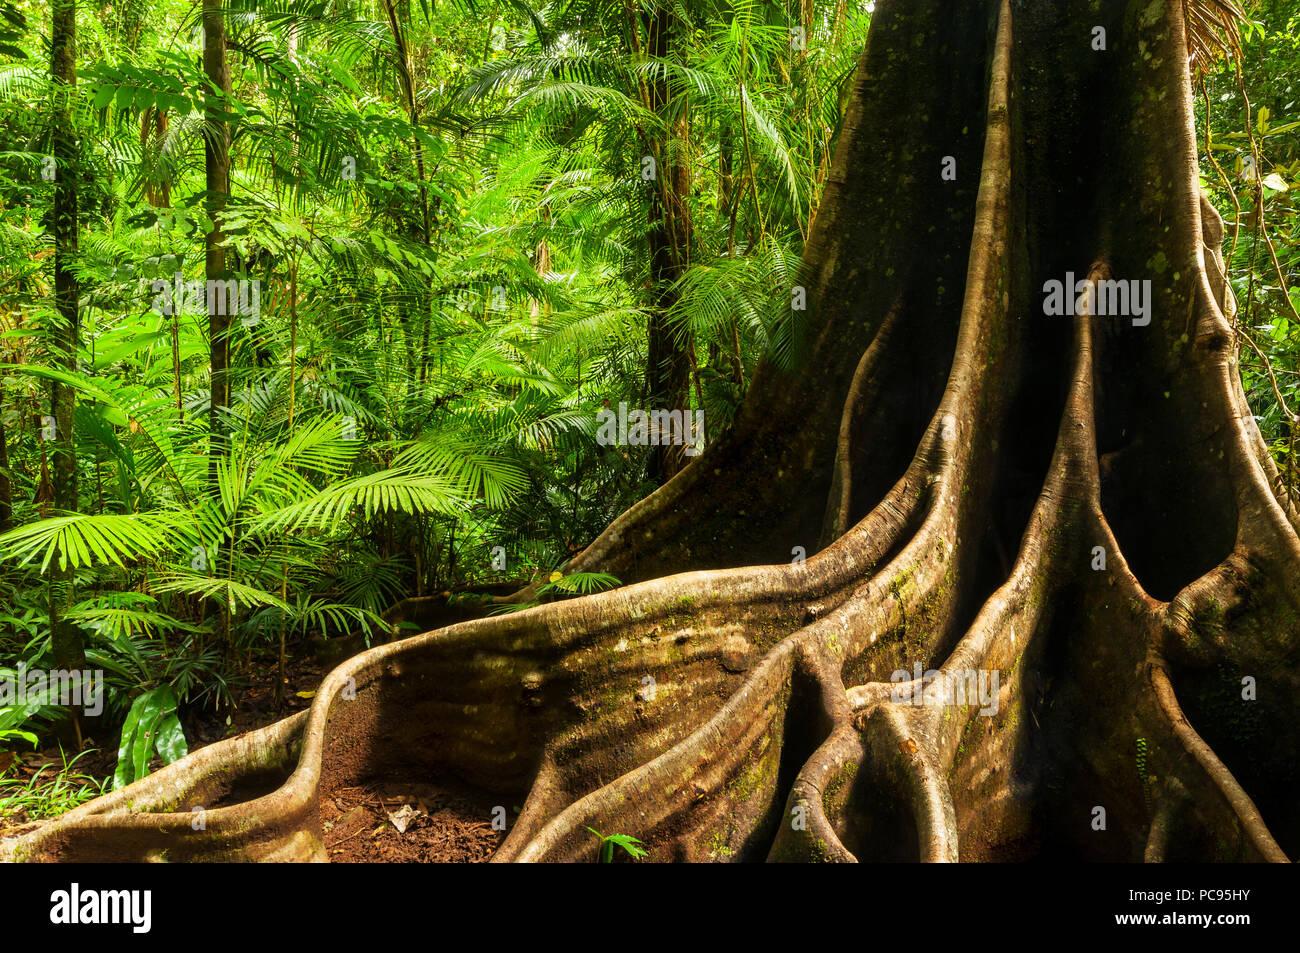 Ancient rainforest giant in the Wet Tropics of Queensland. - Stock Image